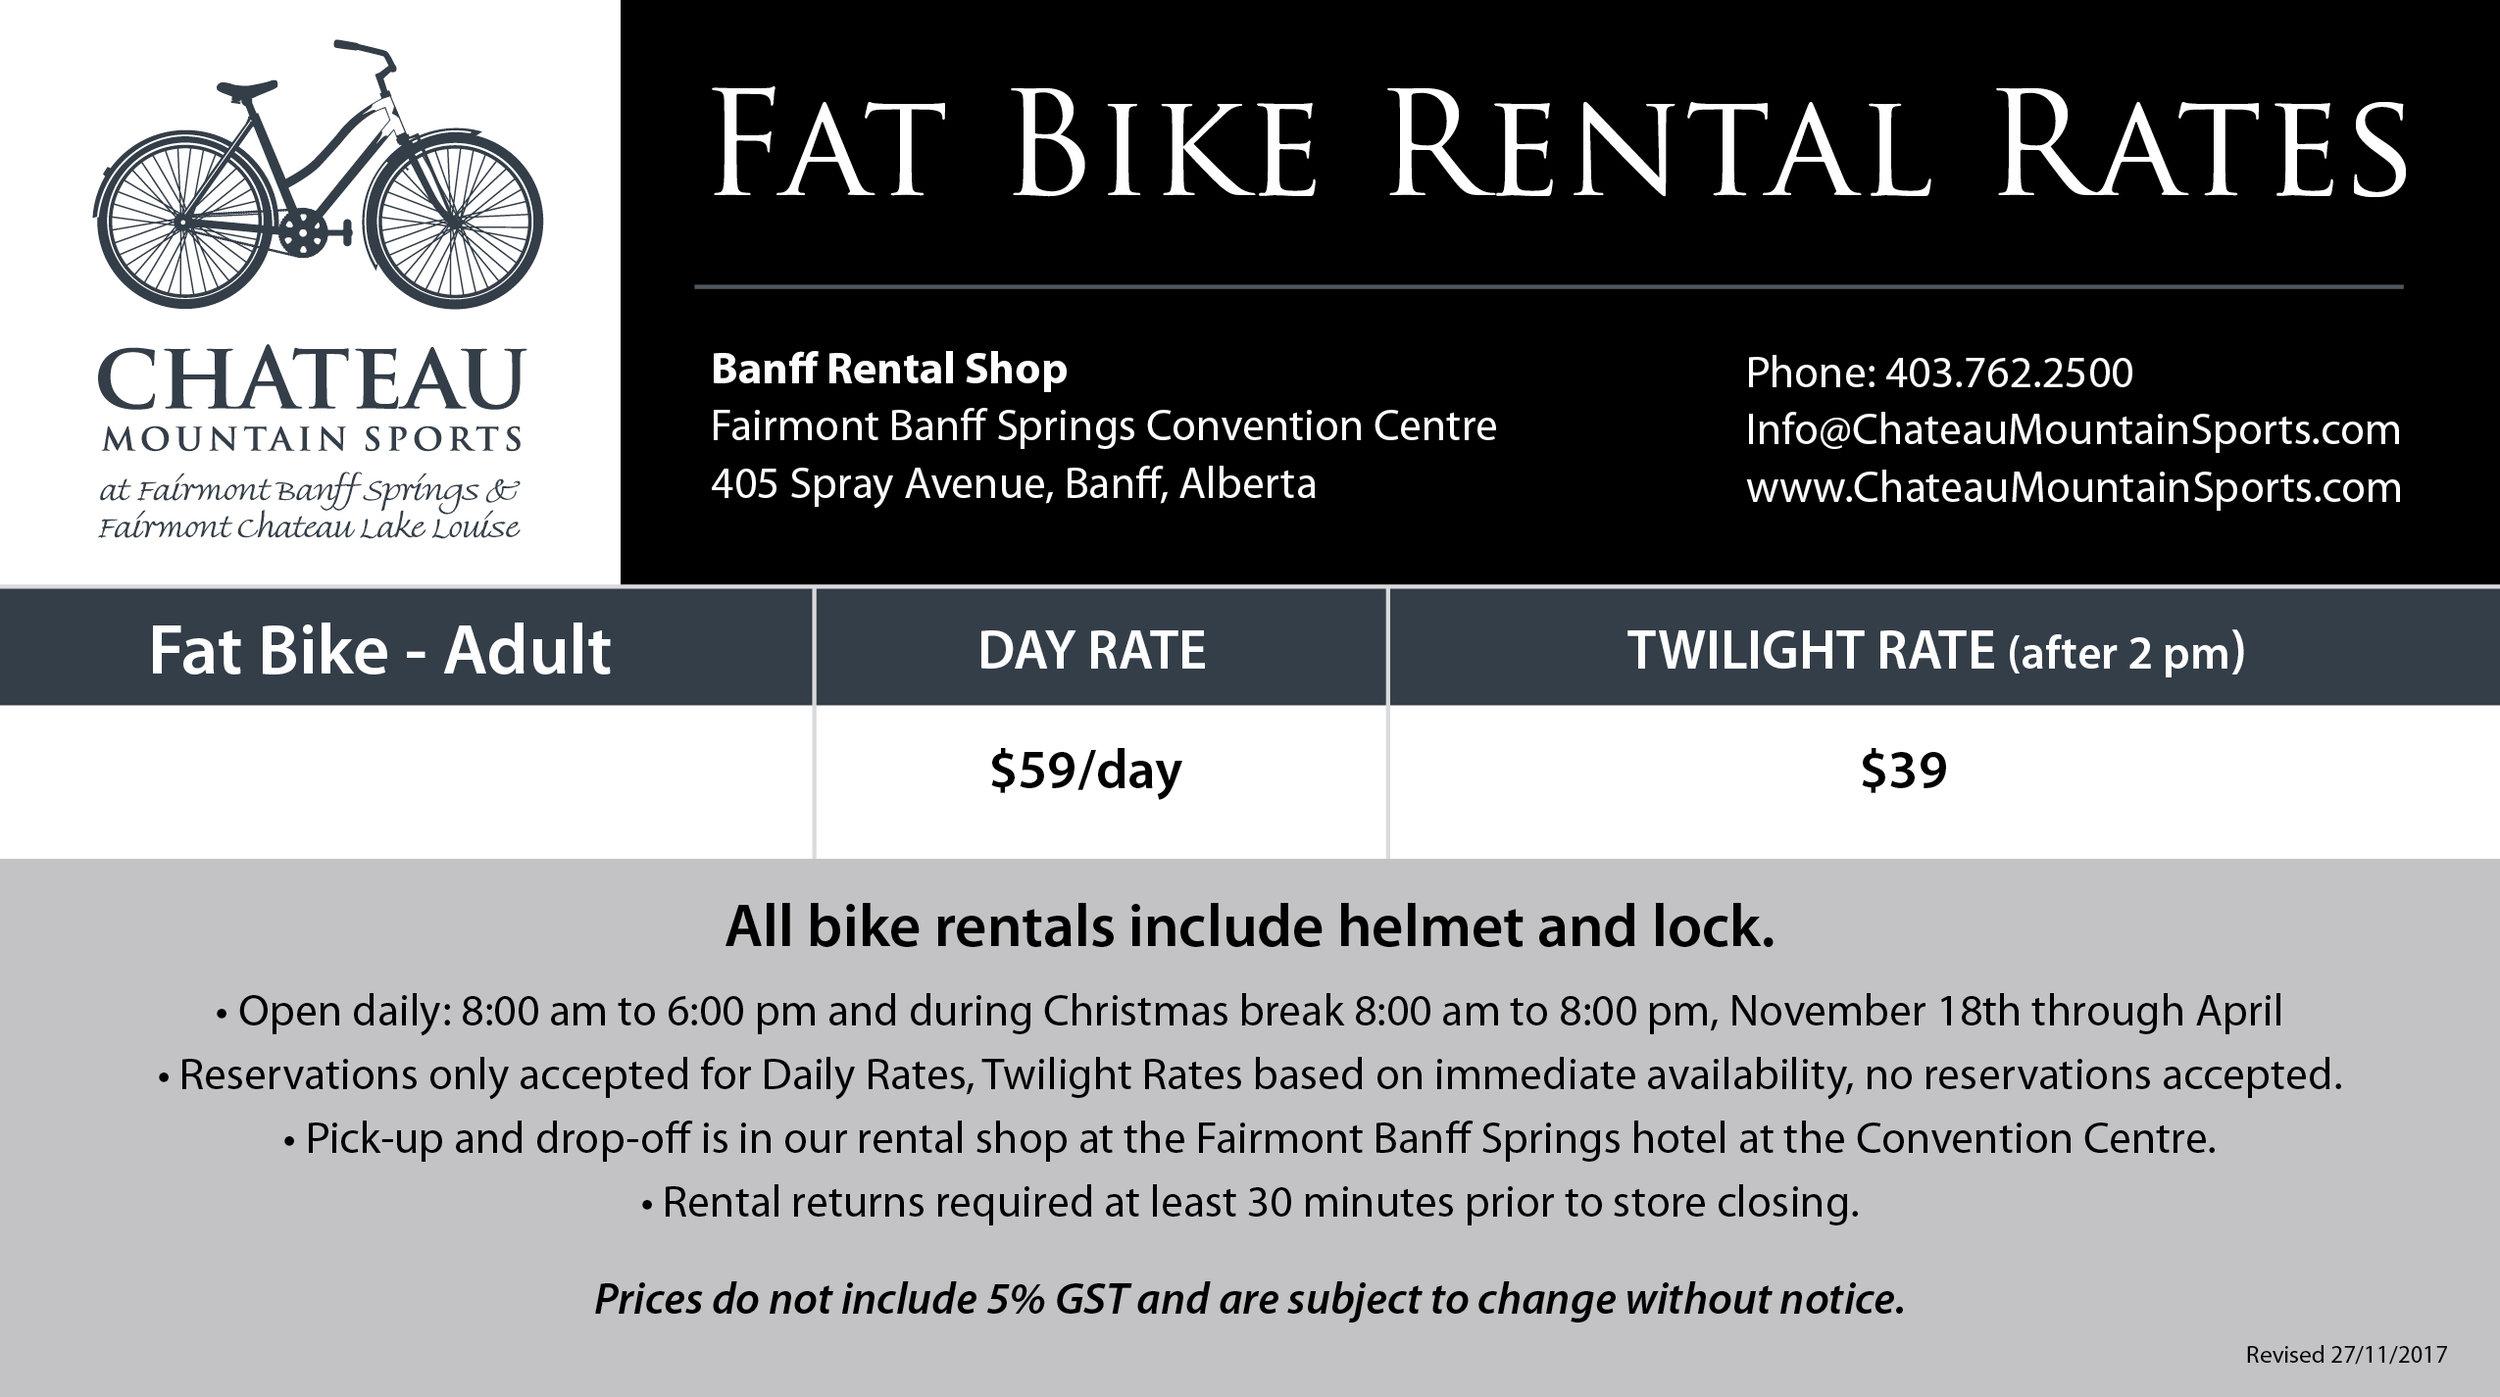 CMS_FatBike_Rental_Rates_web_v5.jpg